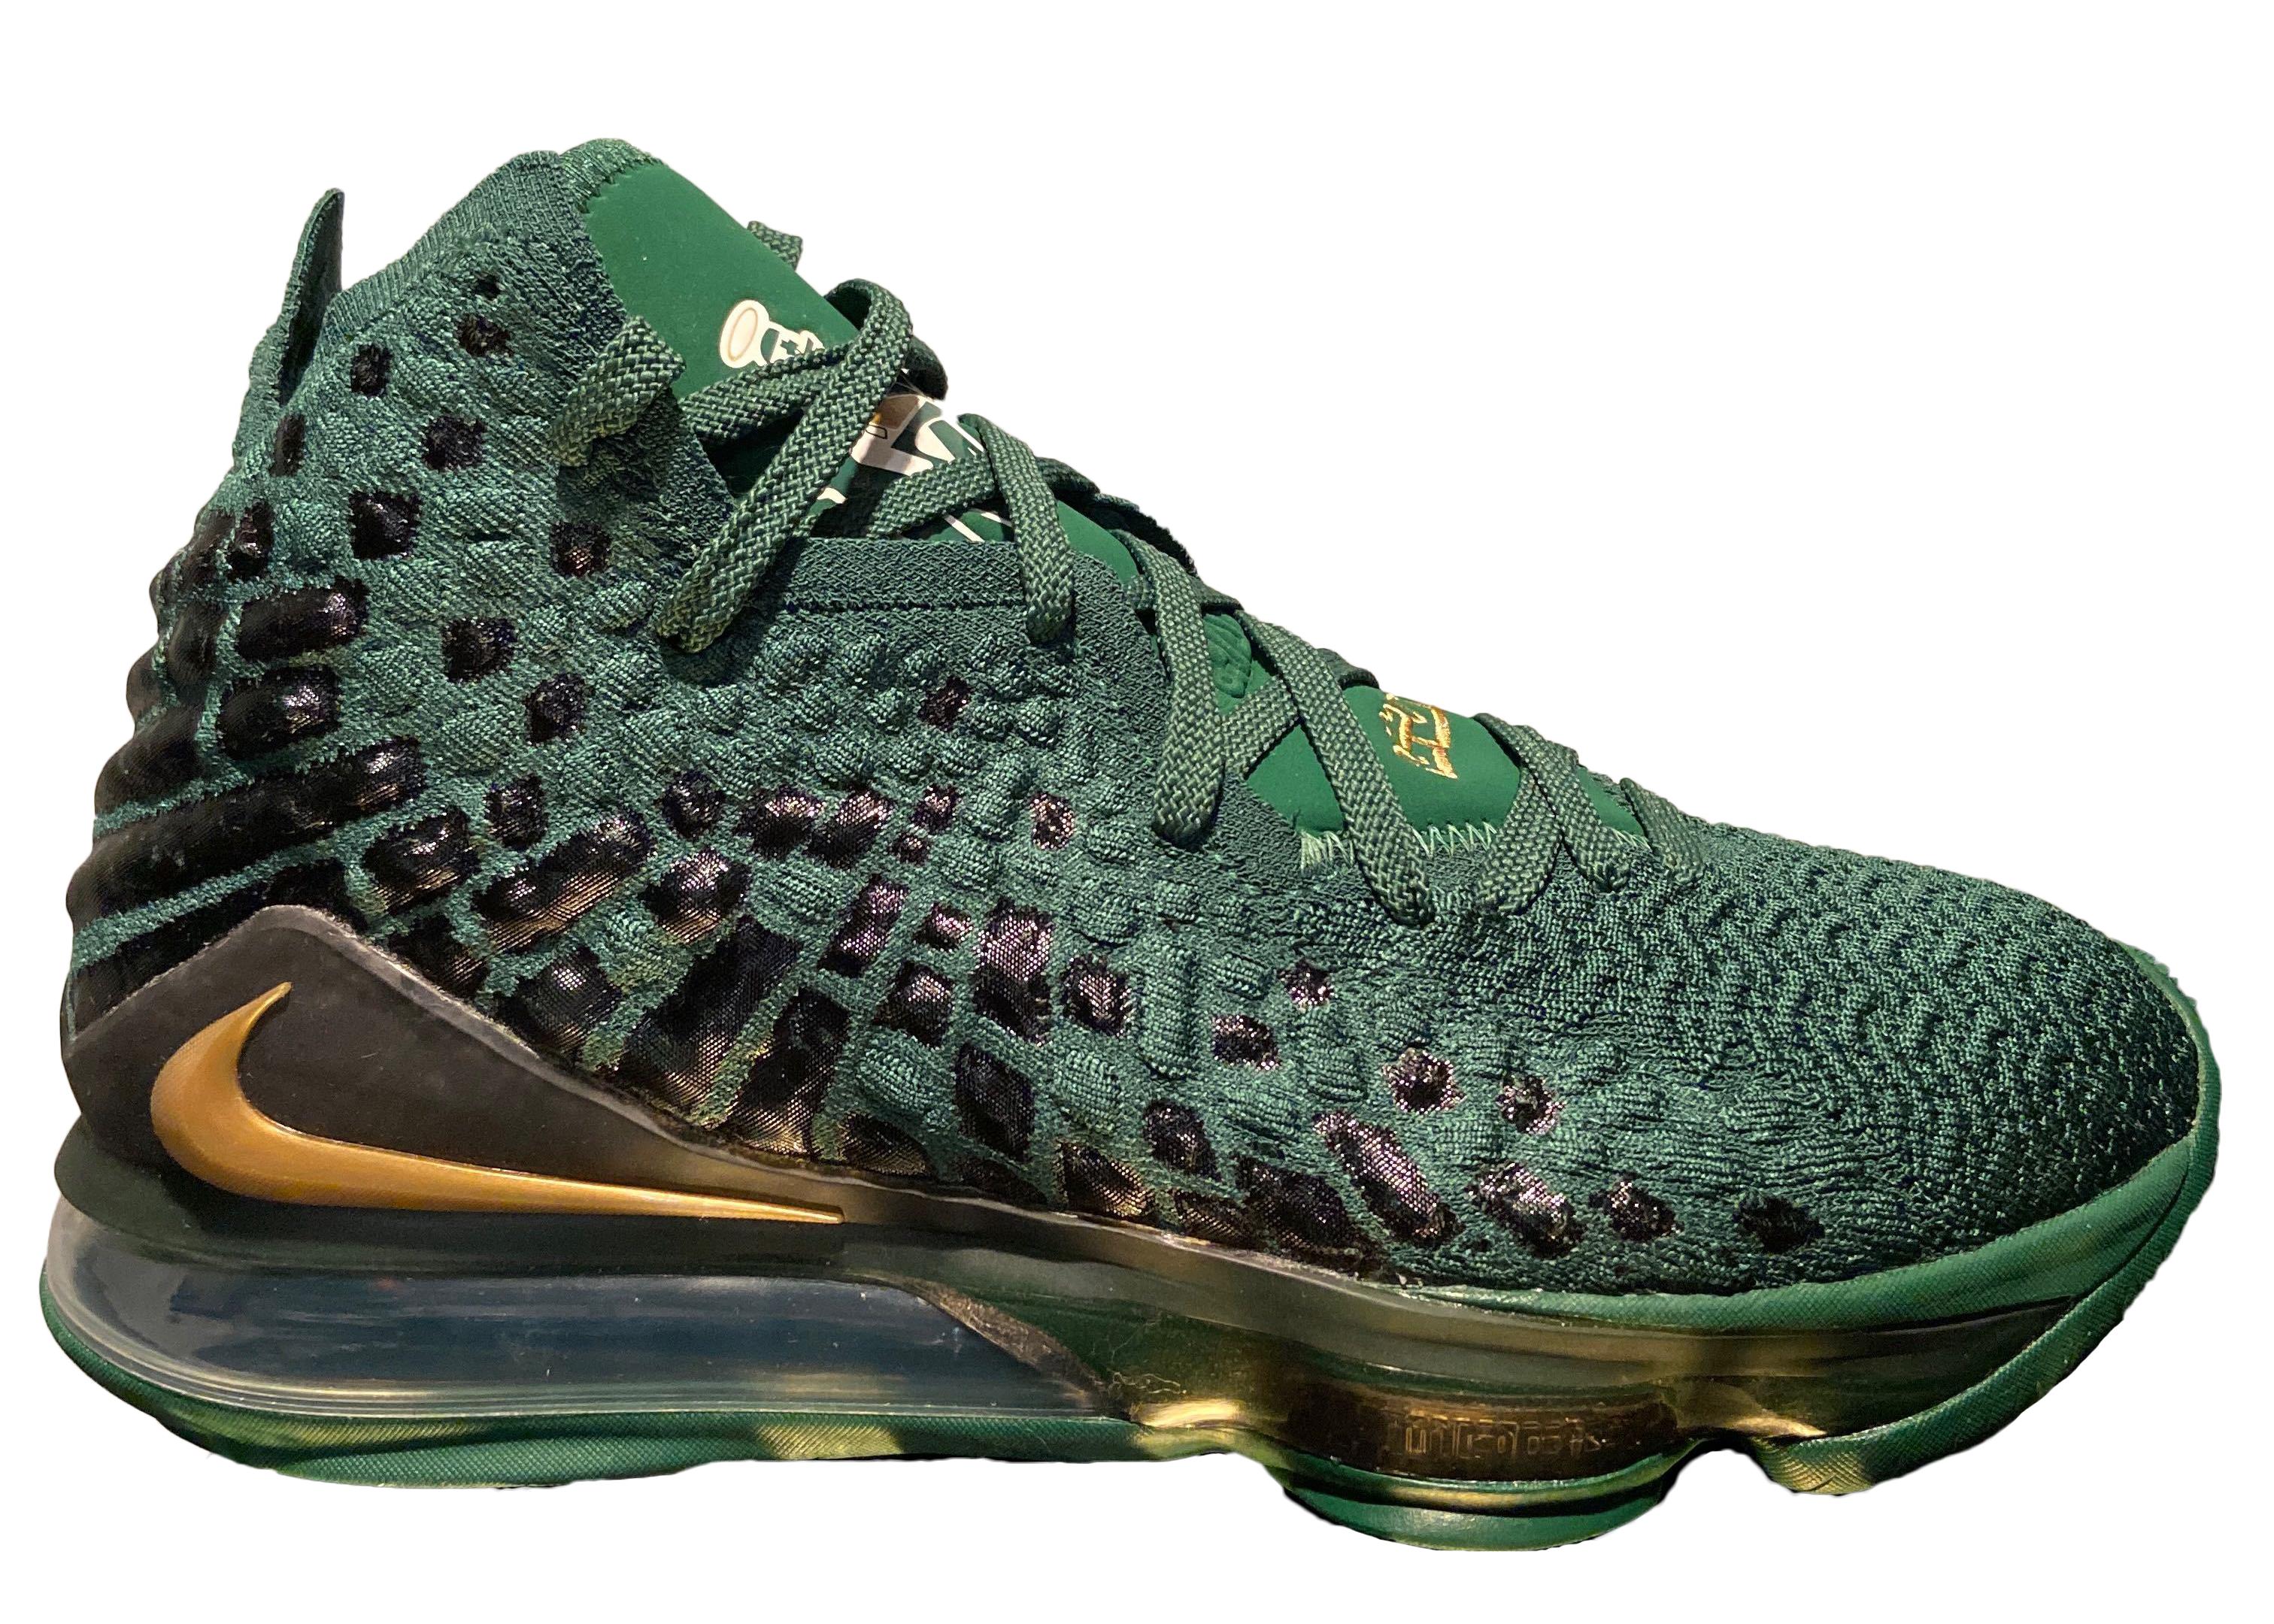 Nike LeBron 17 SVSM Green PE - BQ3177